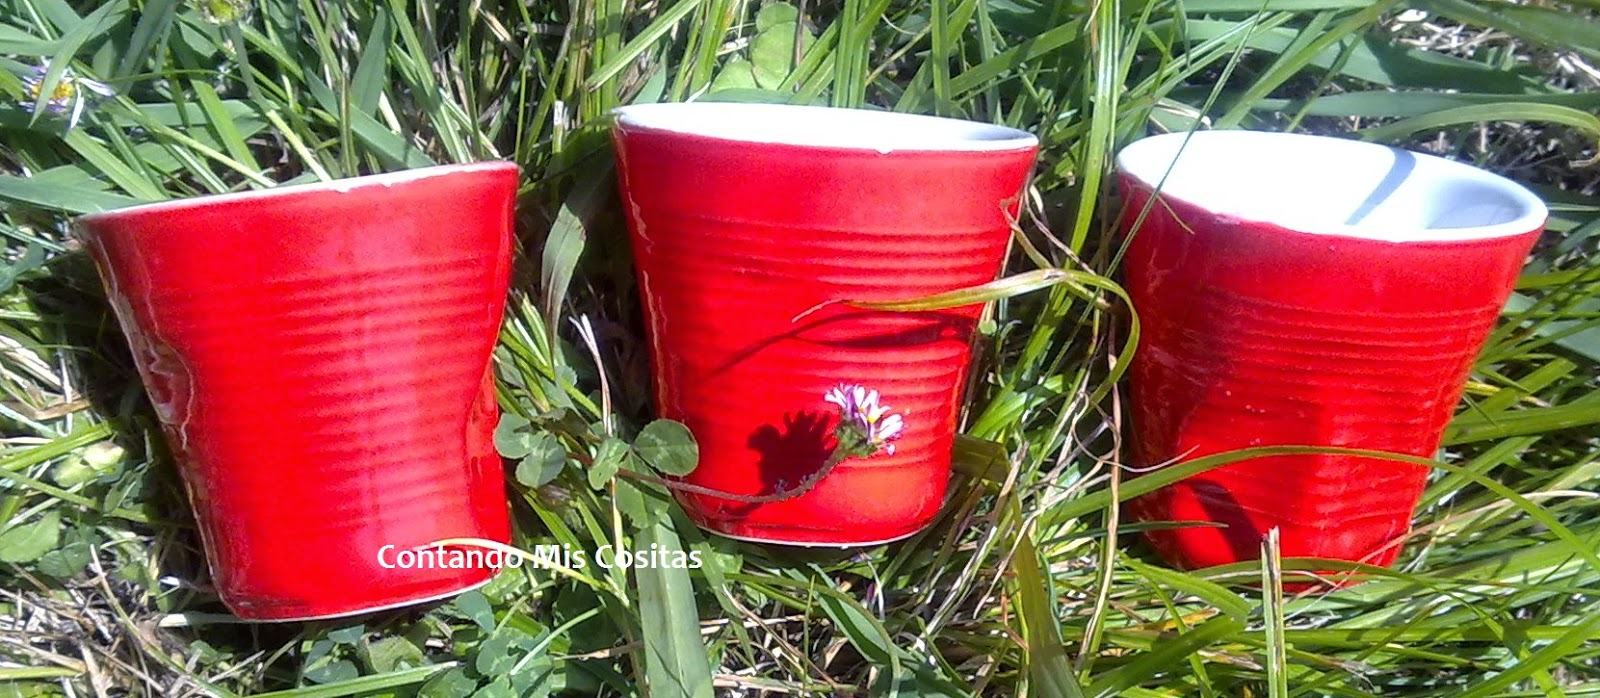 Tazas de cerámica bottega verde